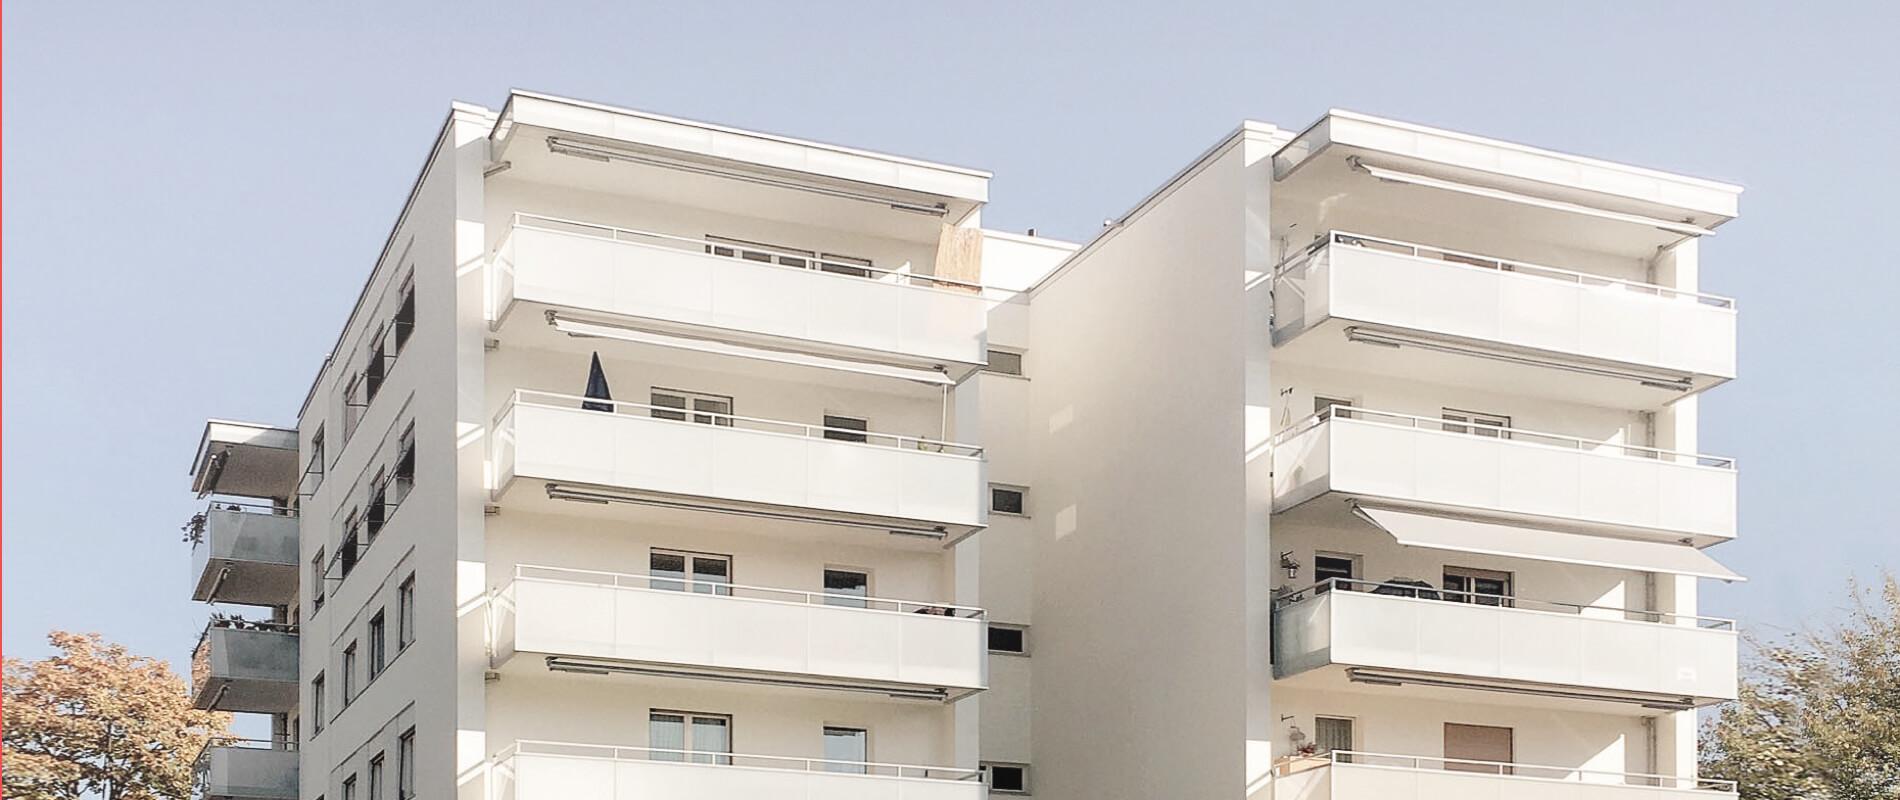 Sanierung Mehrfamilienhaus Ackerstrasse Uster |Referenz |Ettinger Partner